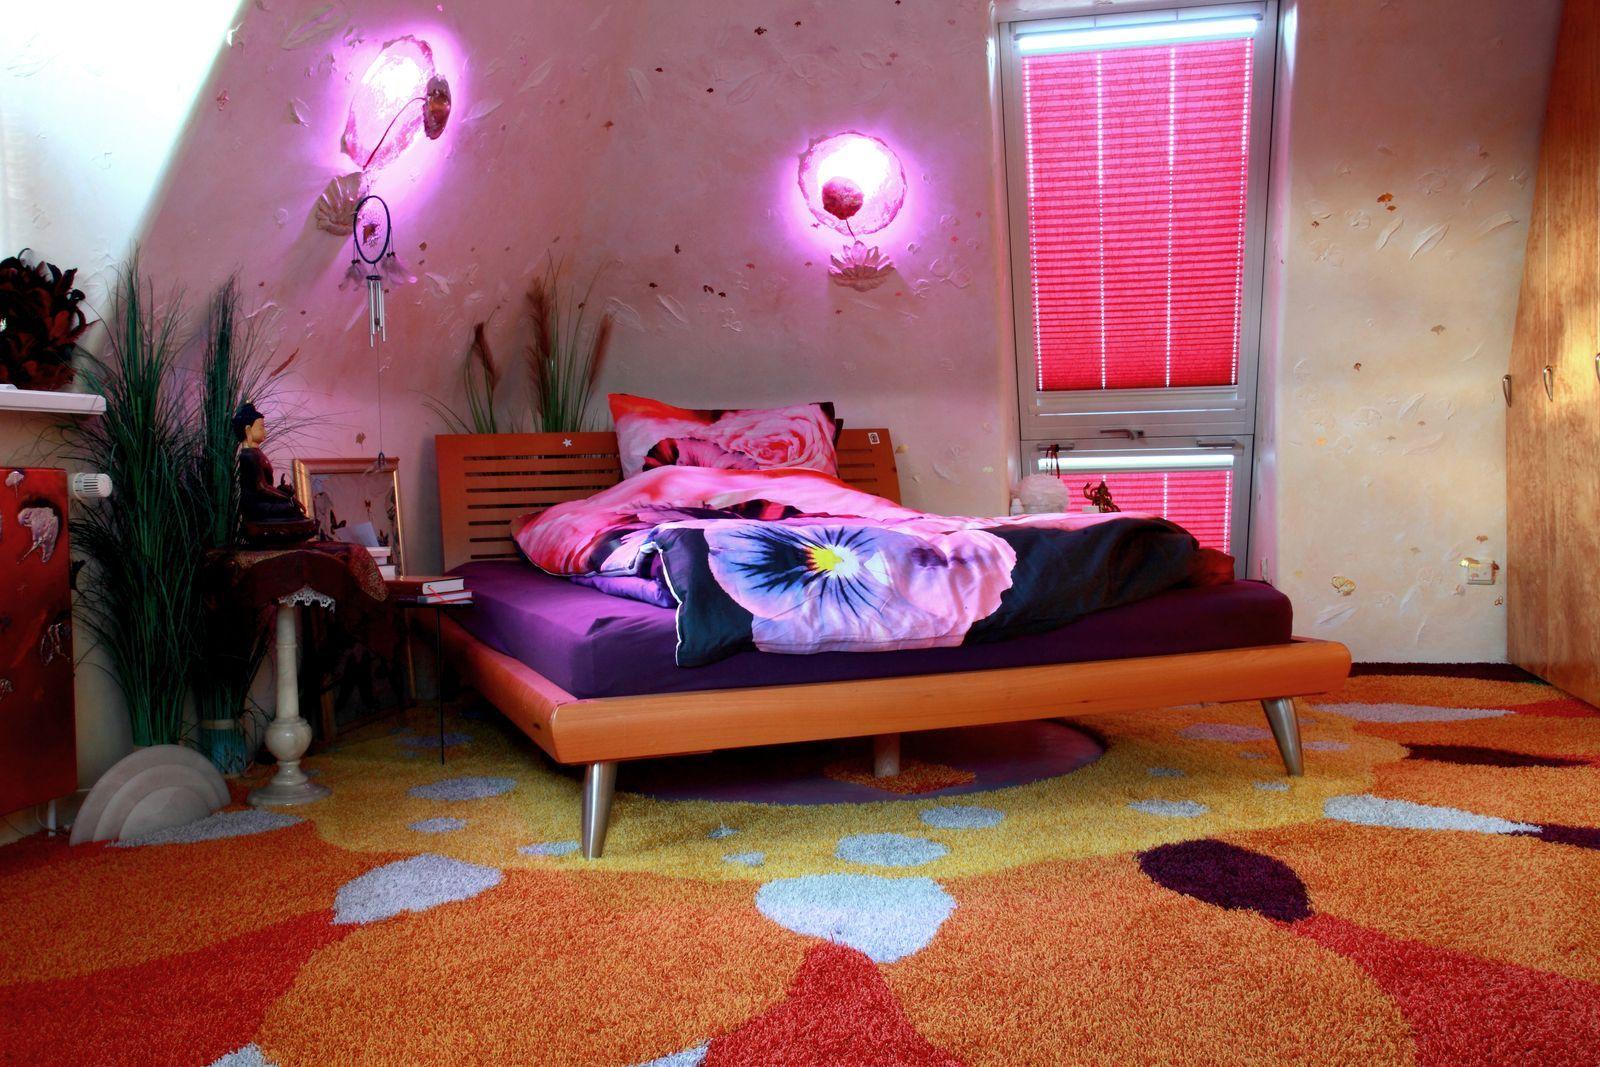 Teppichbild - Lampenrundung - Wandputz